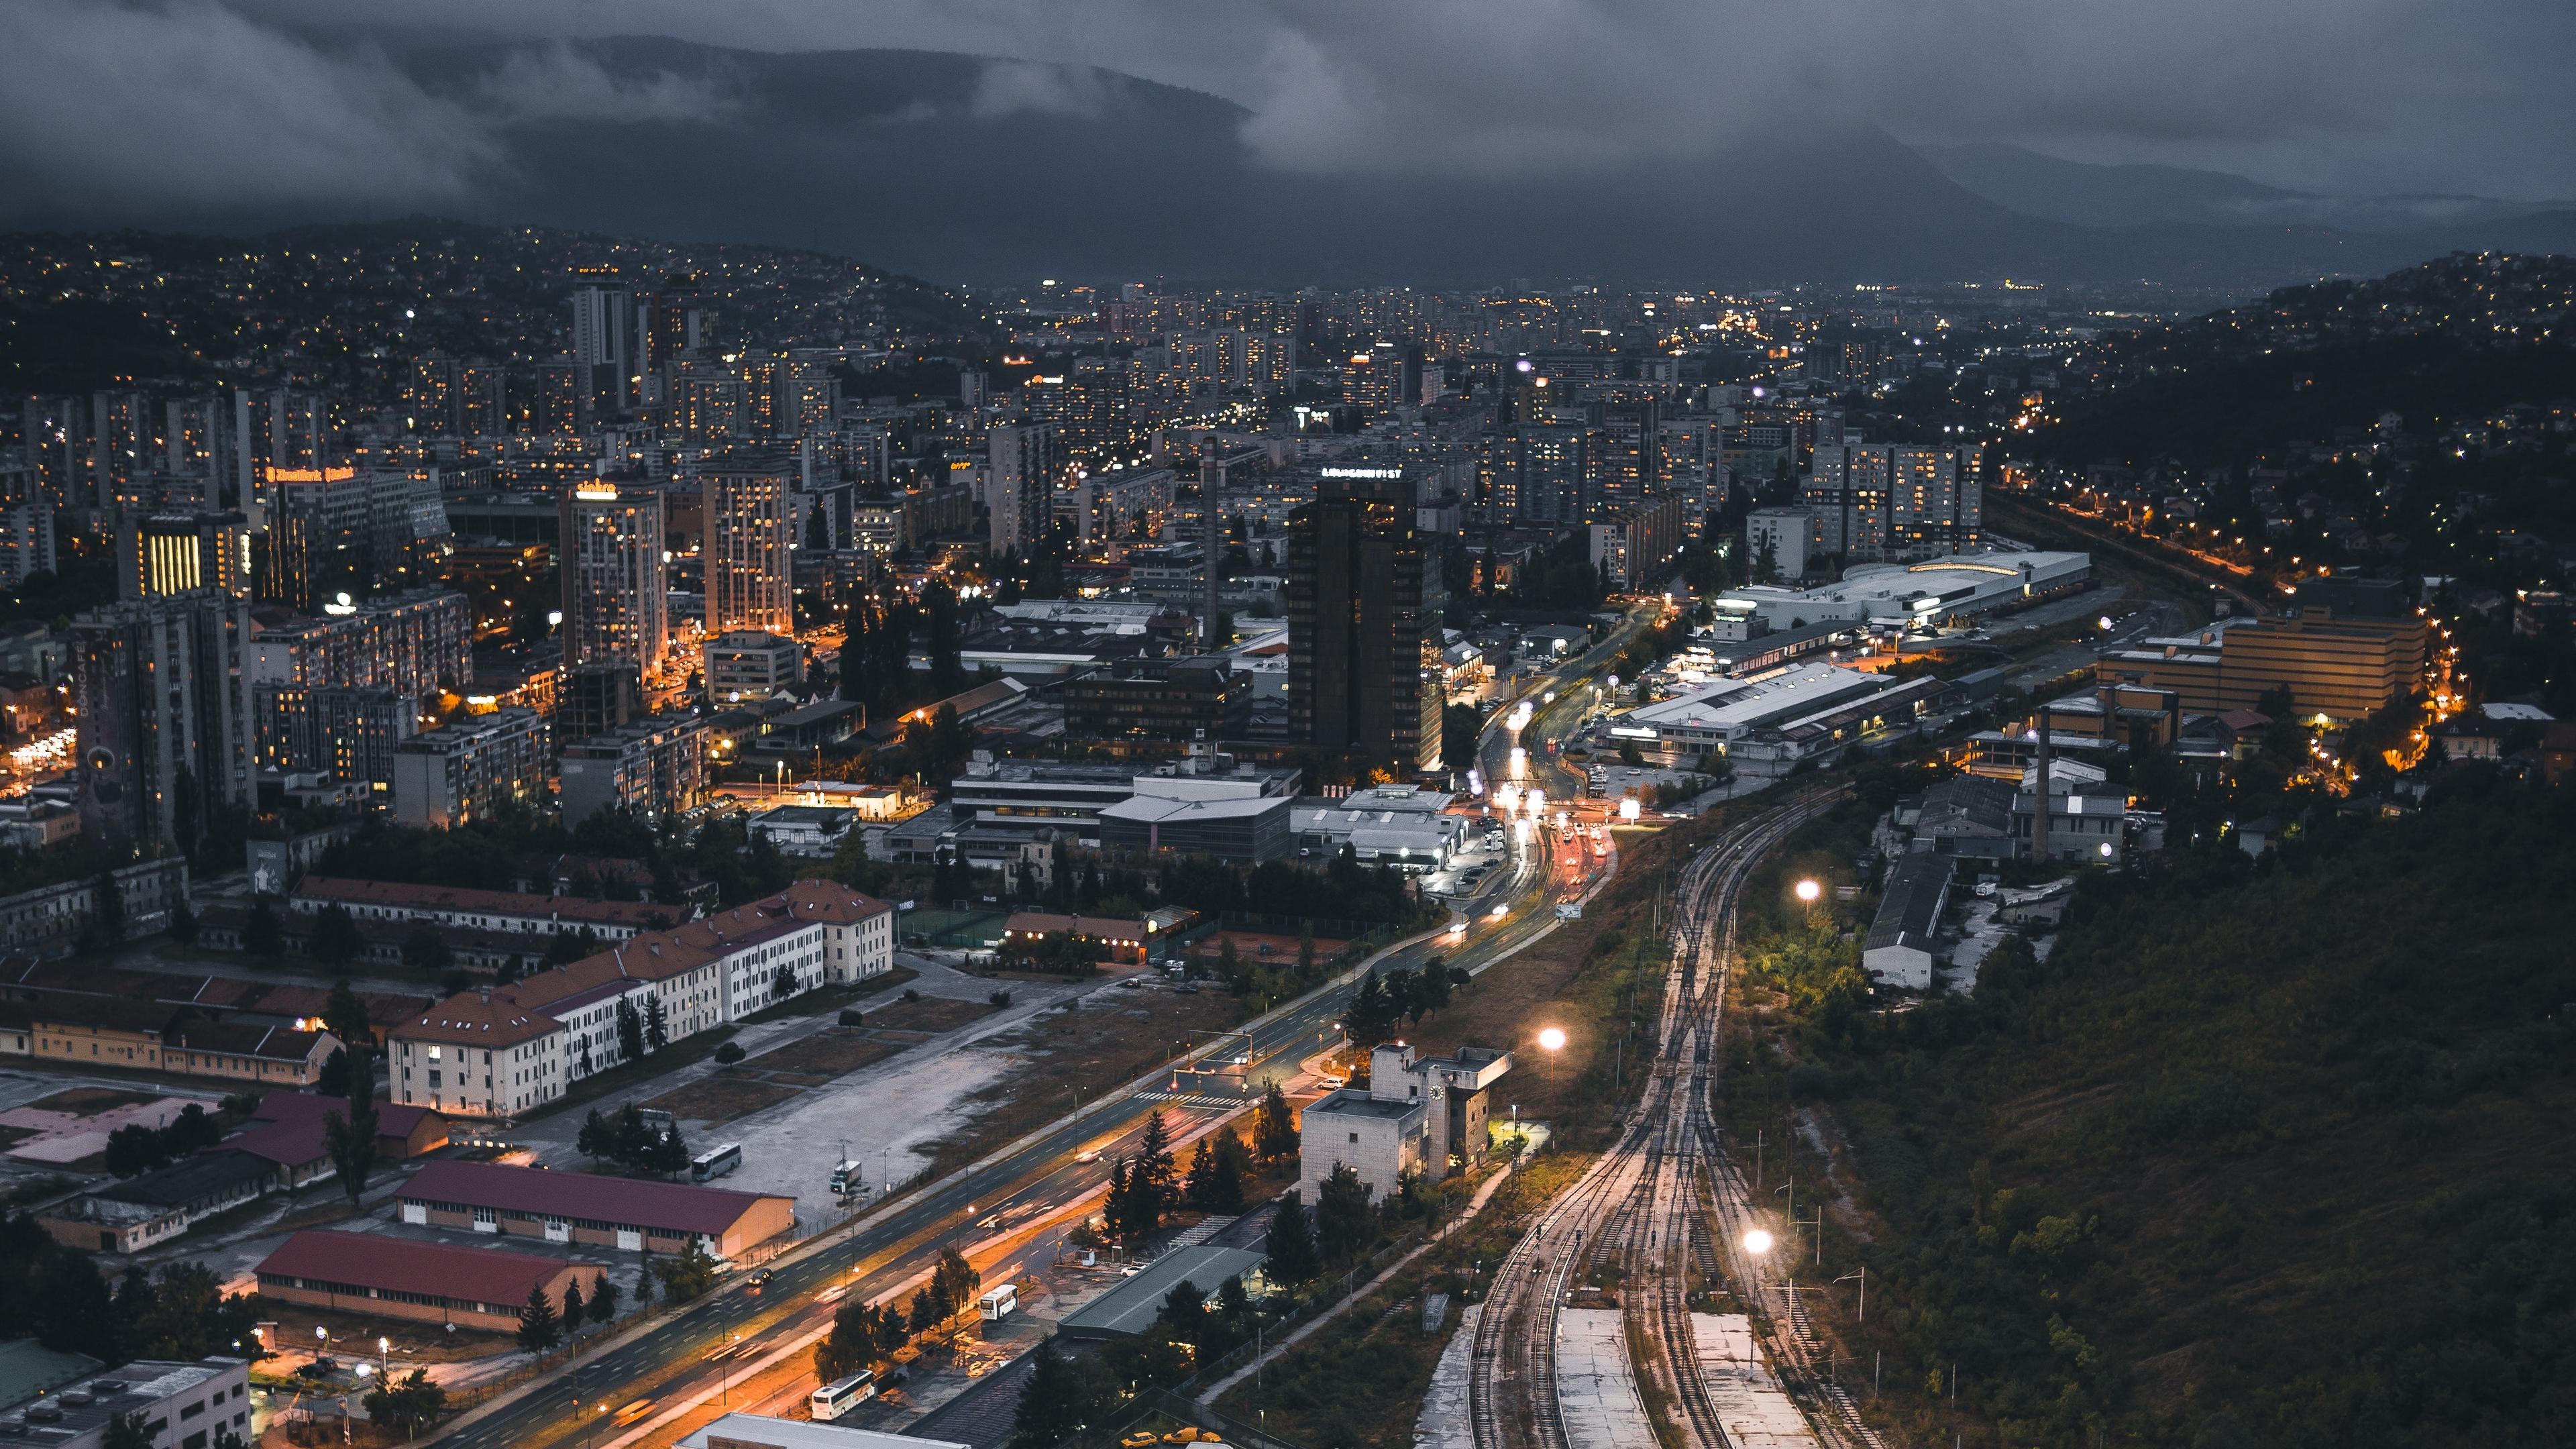 night city top view buildings railway 4k 1538068879 - night city, top view, buildings, railway 4k - top view, night city, buildings